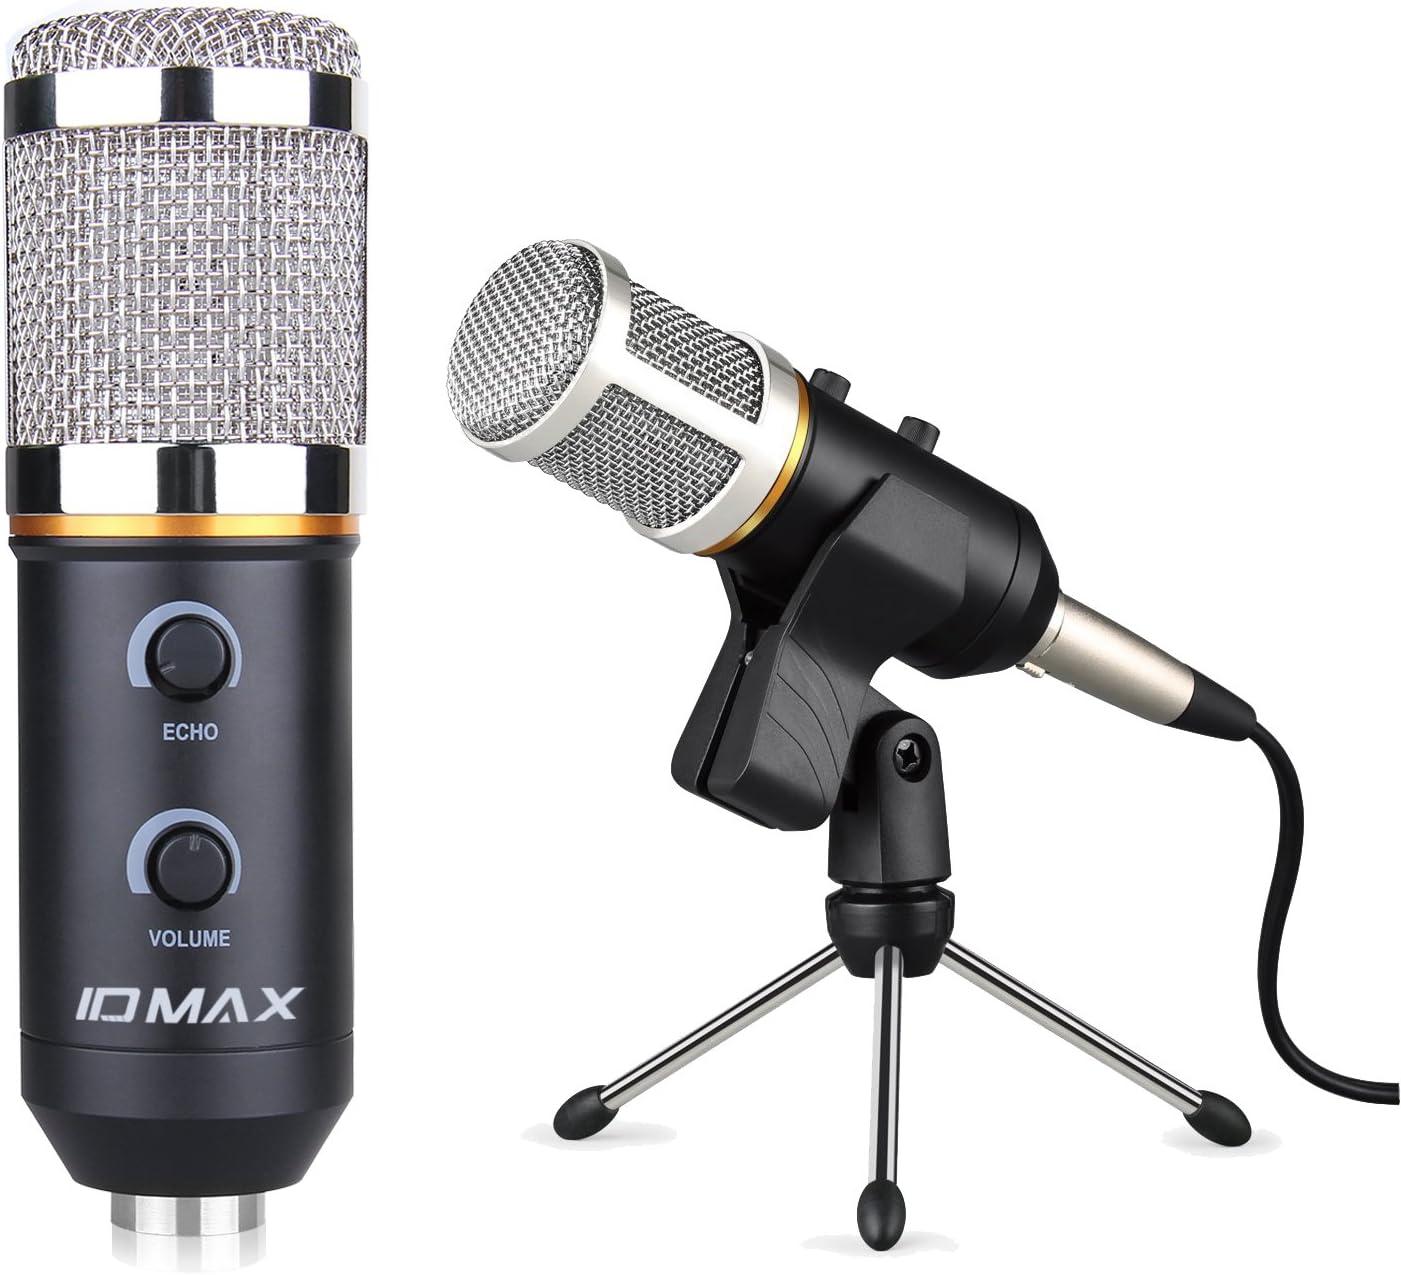 PC micrófono, ID Max profesional micrófono de condensador USB 3,5 ...